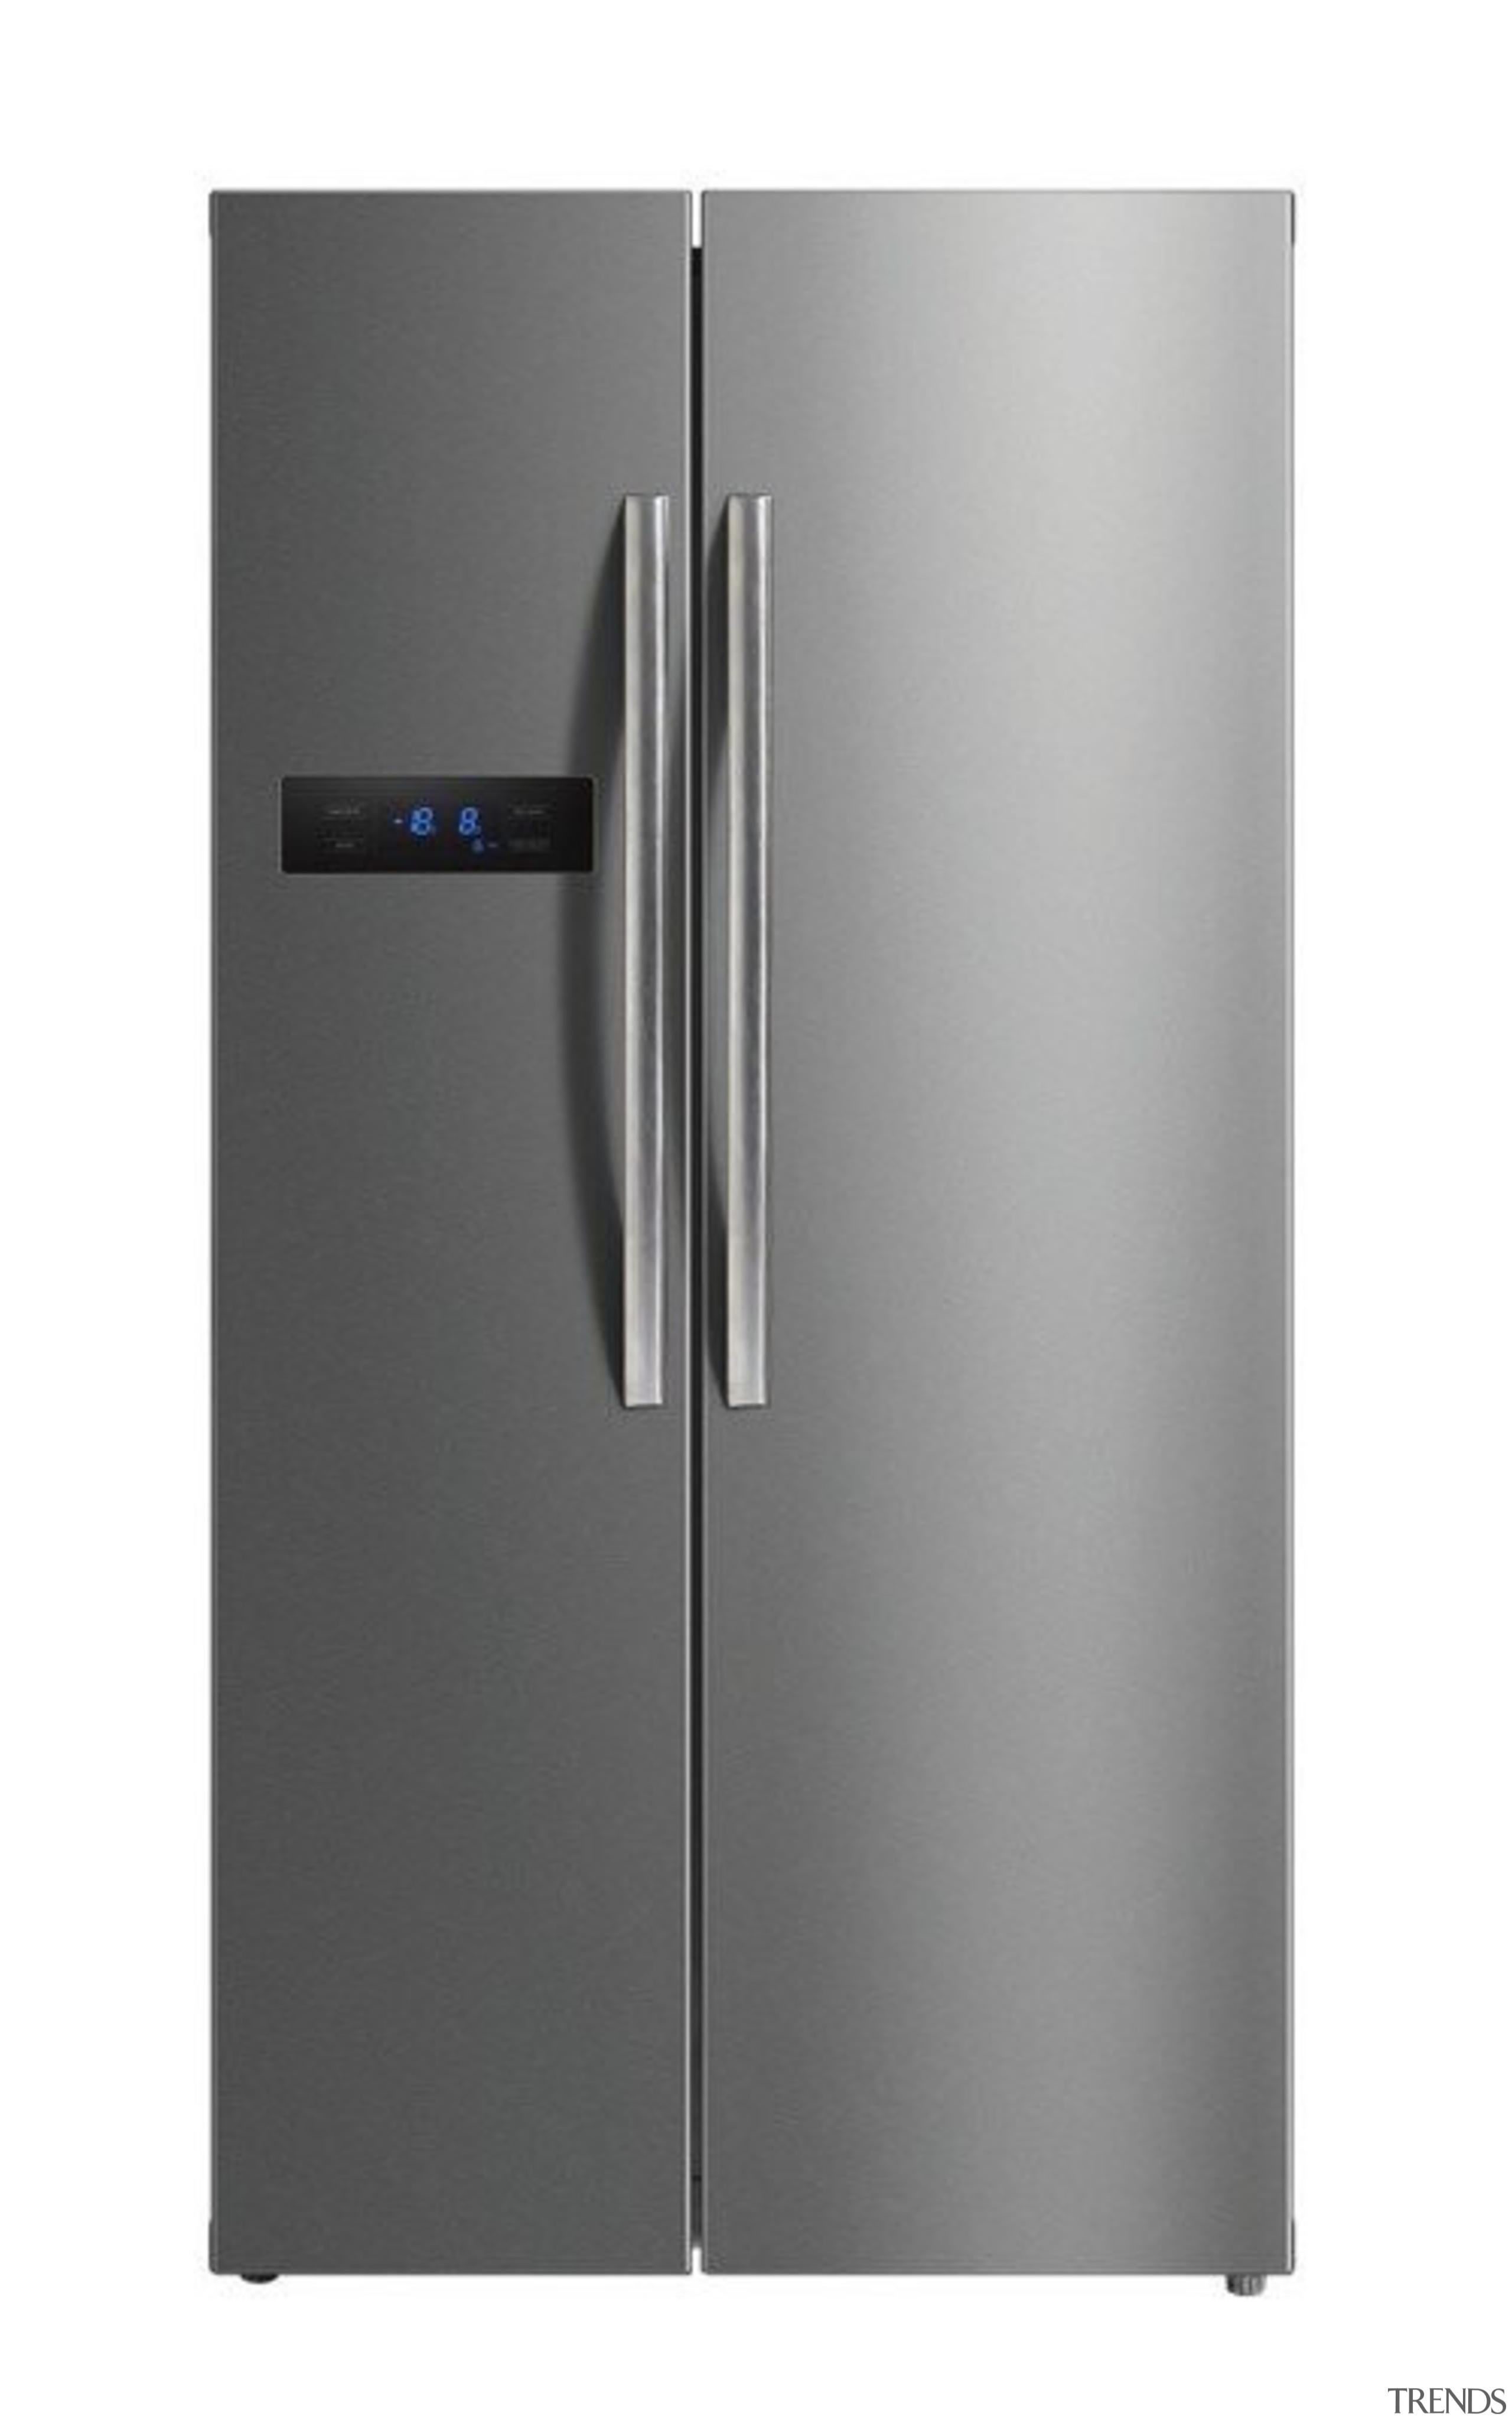 584L Side-by-Side Fridge FreezerGross Capacity: 584L349L Fridge + home appliance, kitchen appliance, major appliance, product, product design, refrigerator, gray, white